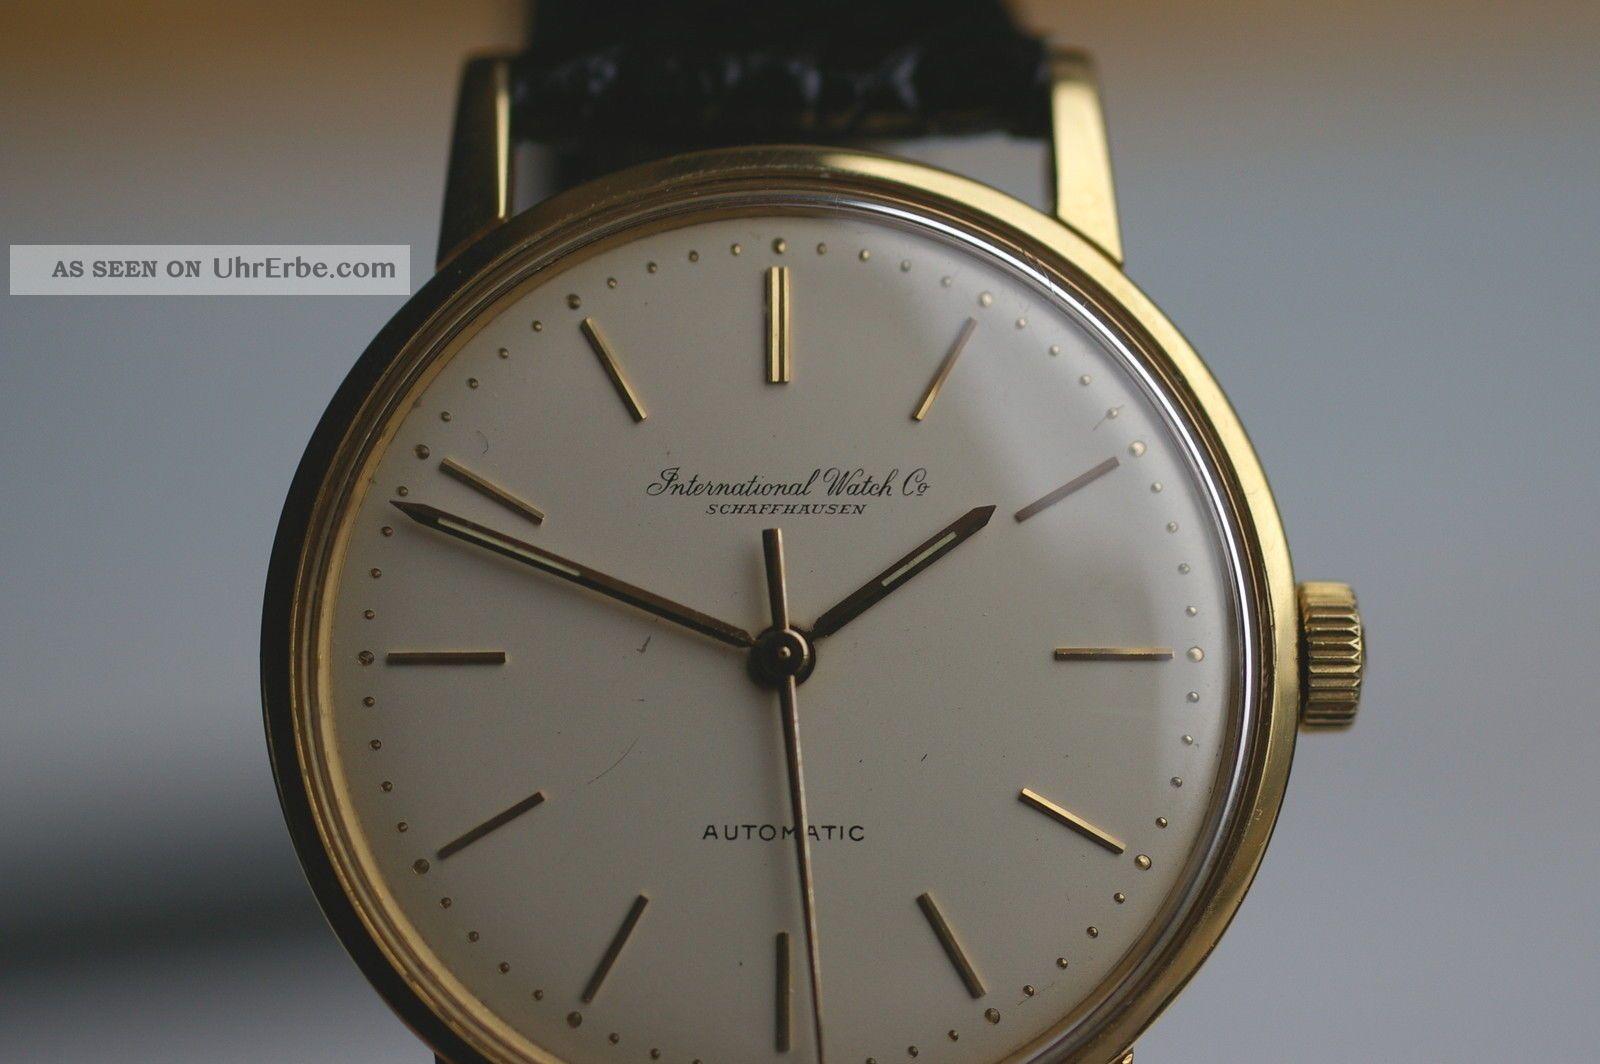 Iwc Schaffhausen Automatic Swiss Goldarmbanduhr Kaliber 853 Ca.  1960 Sammleruhr Armbanduhren Bild